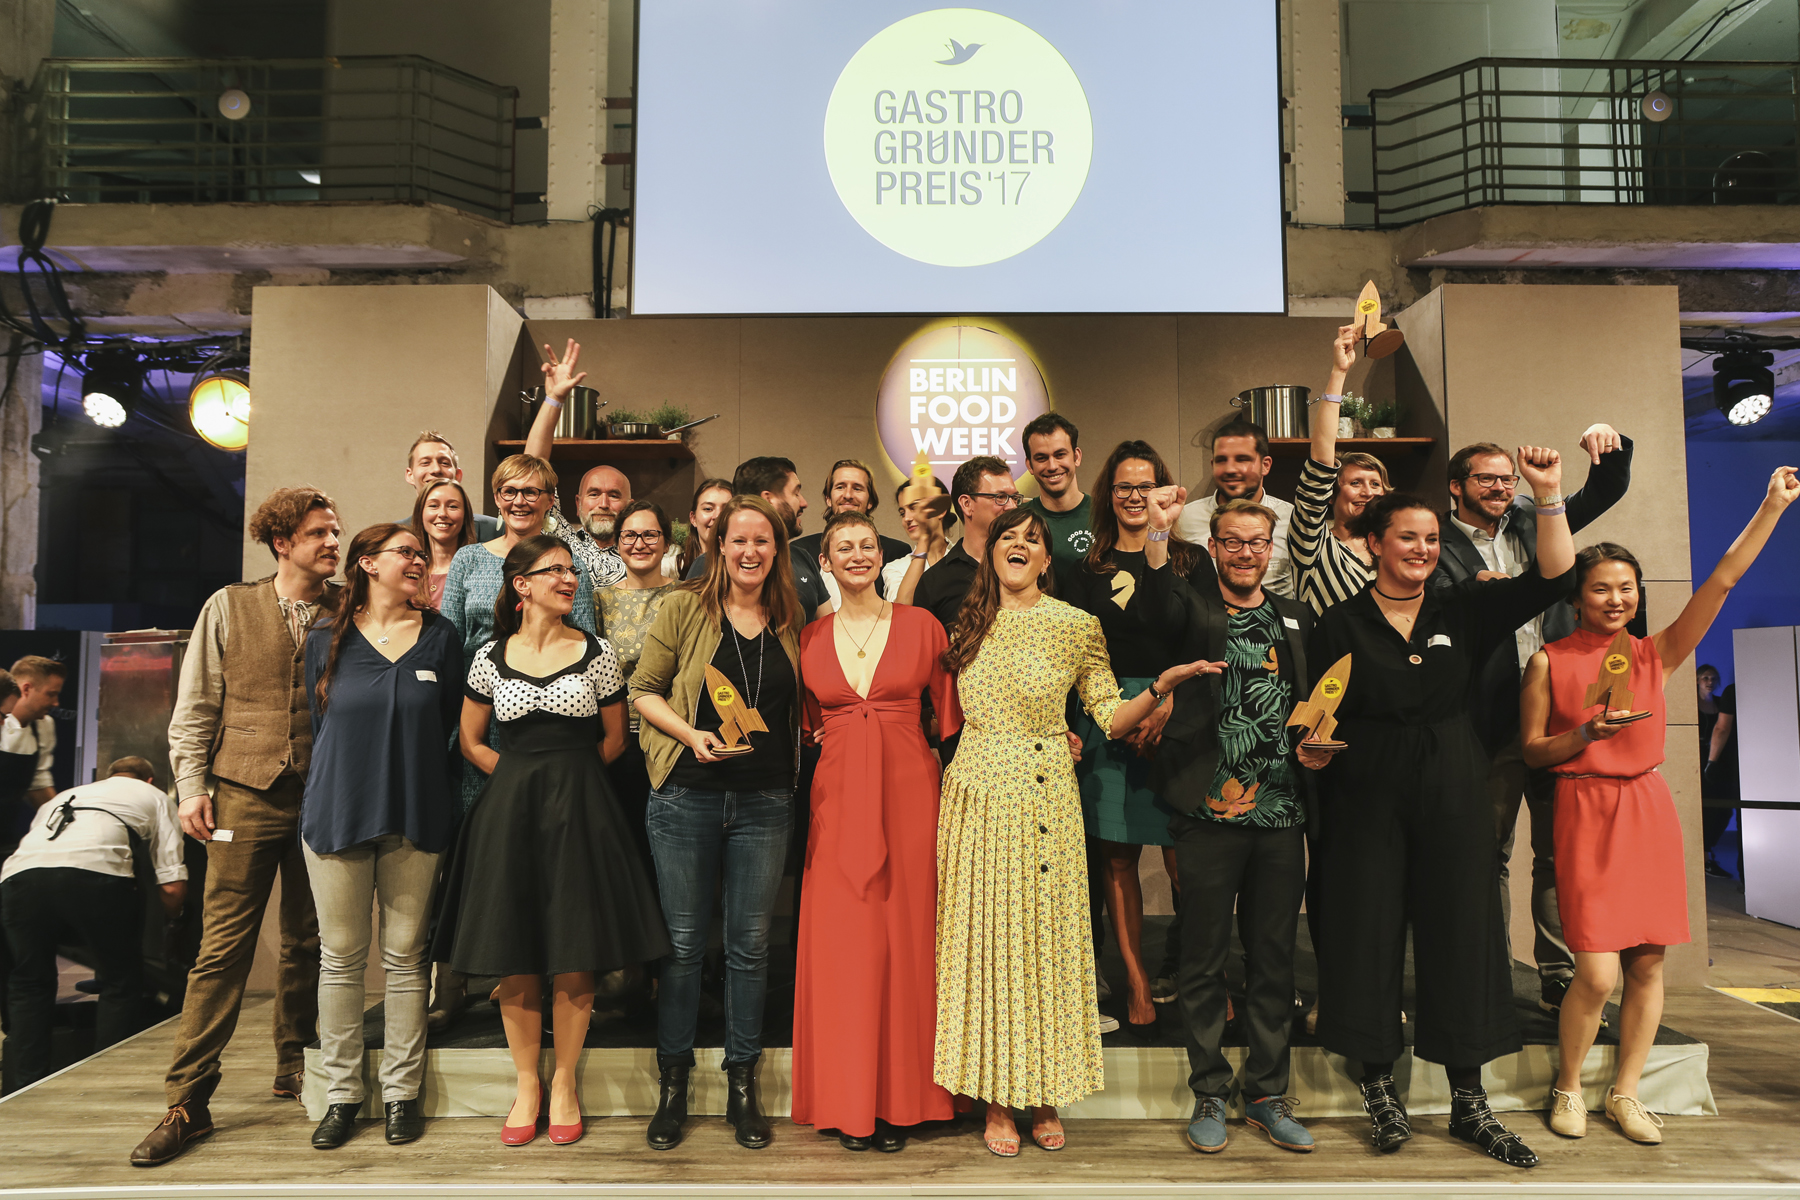 Preisverleihung Gastro-Gründerpreis 2017